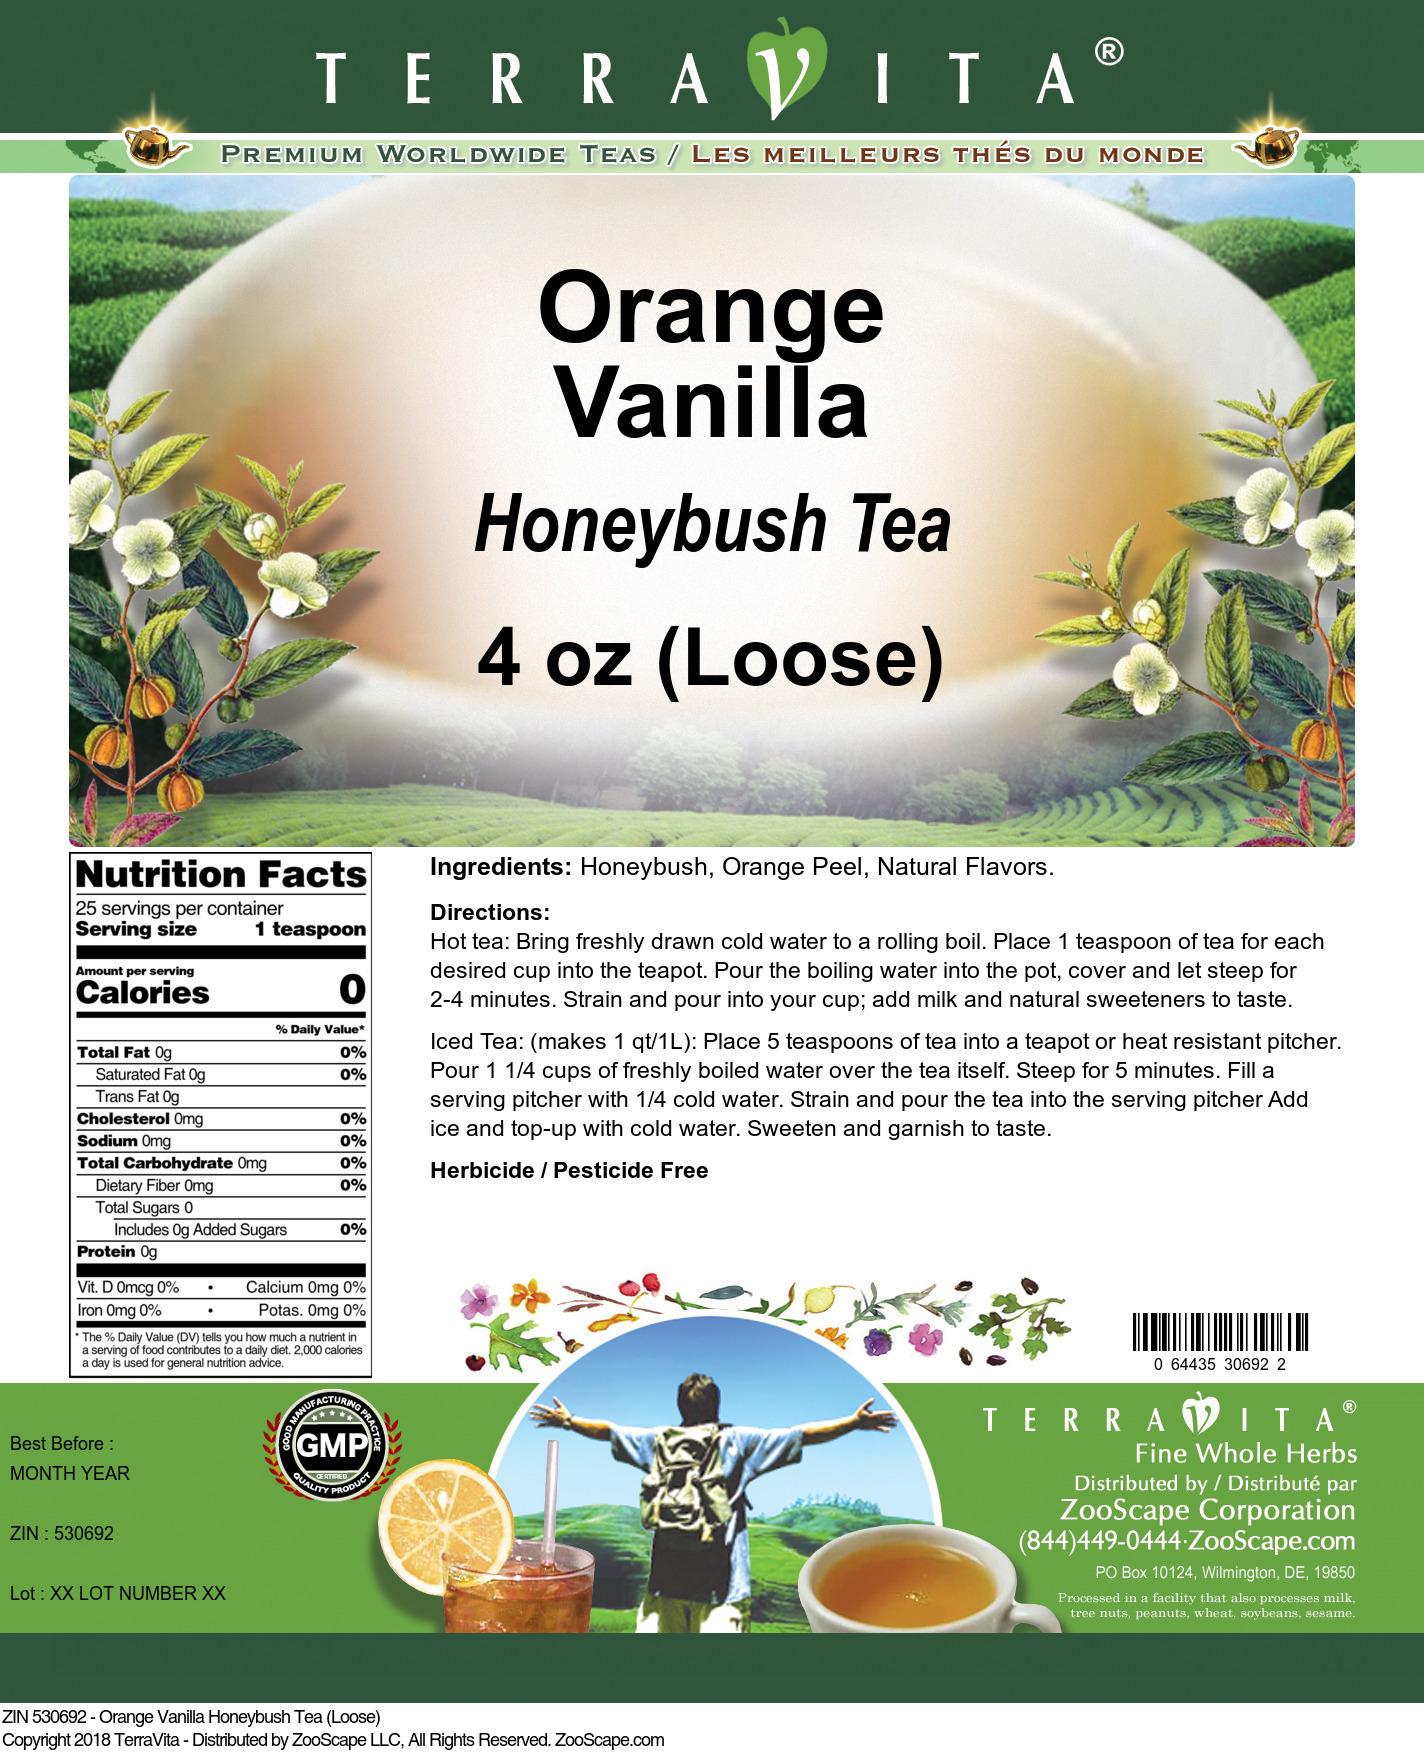 Orange Vanilla Honeybush Tea (Loose)